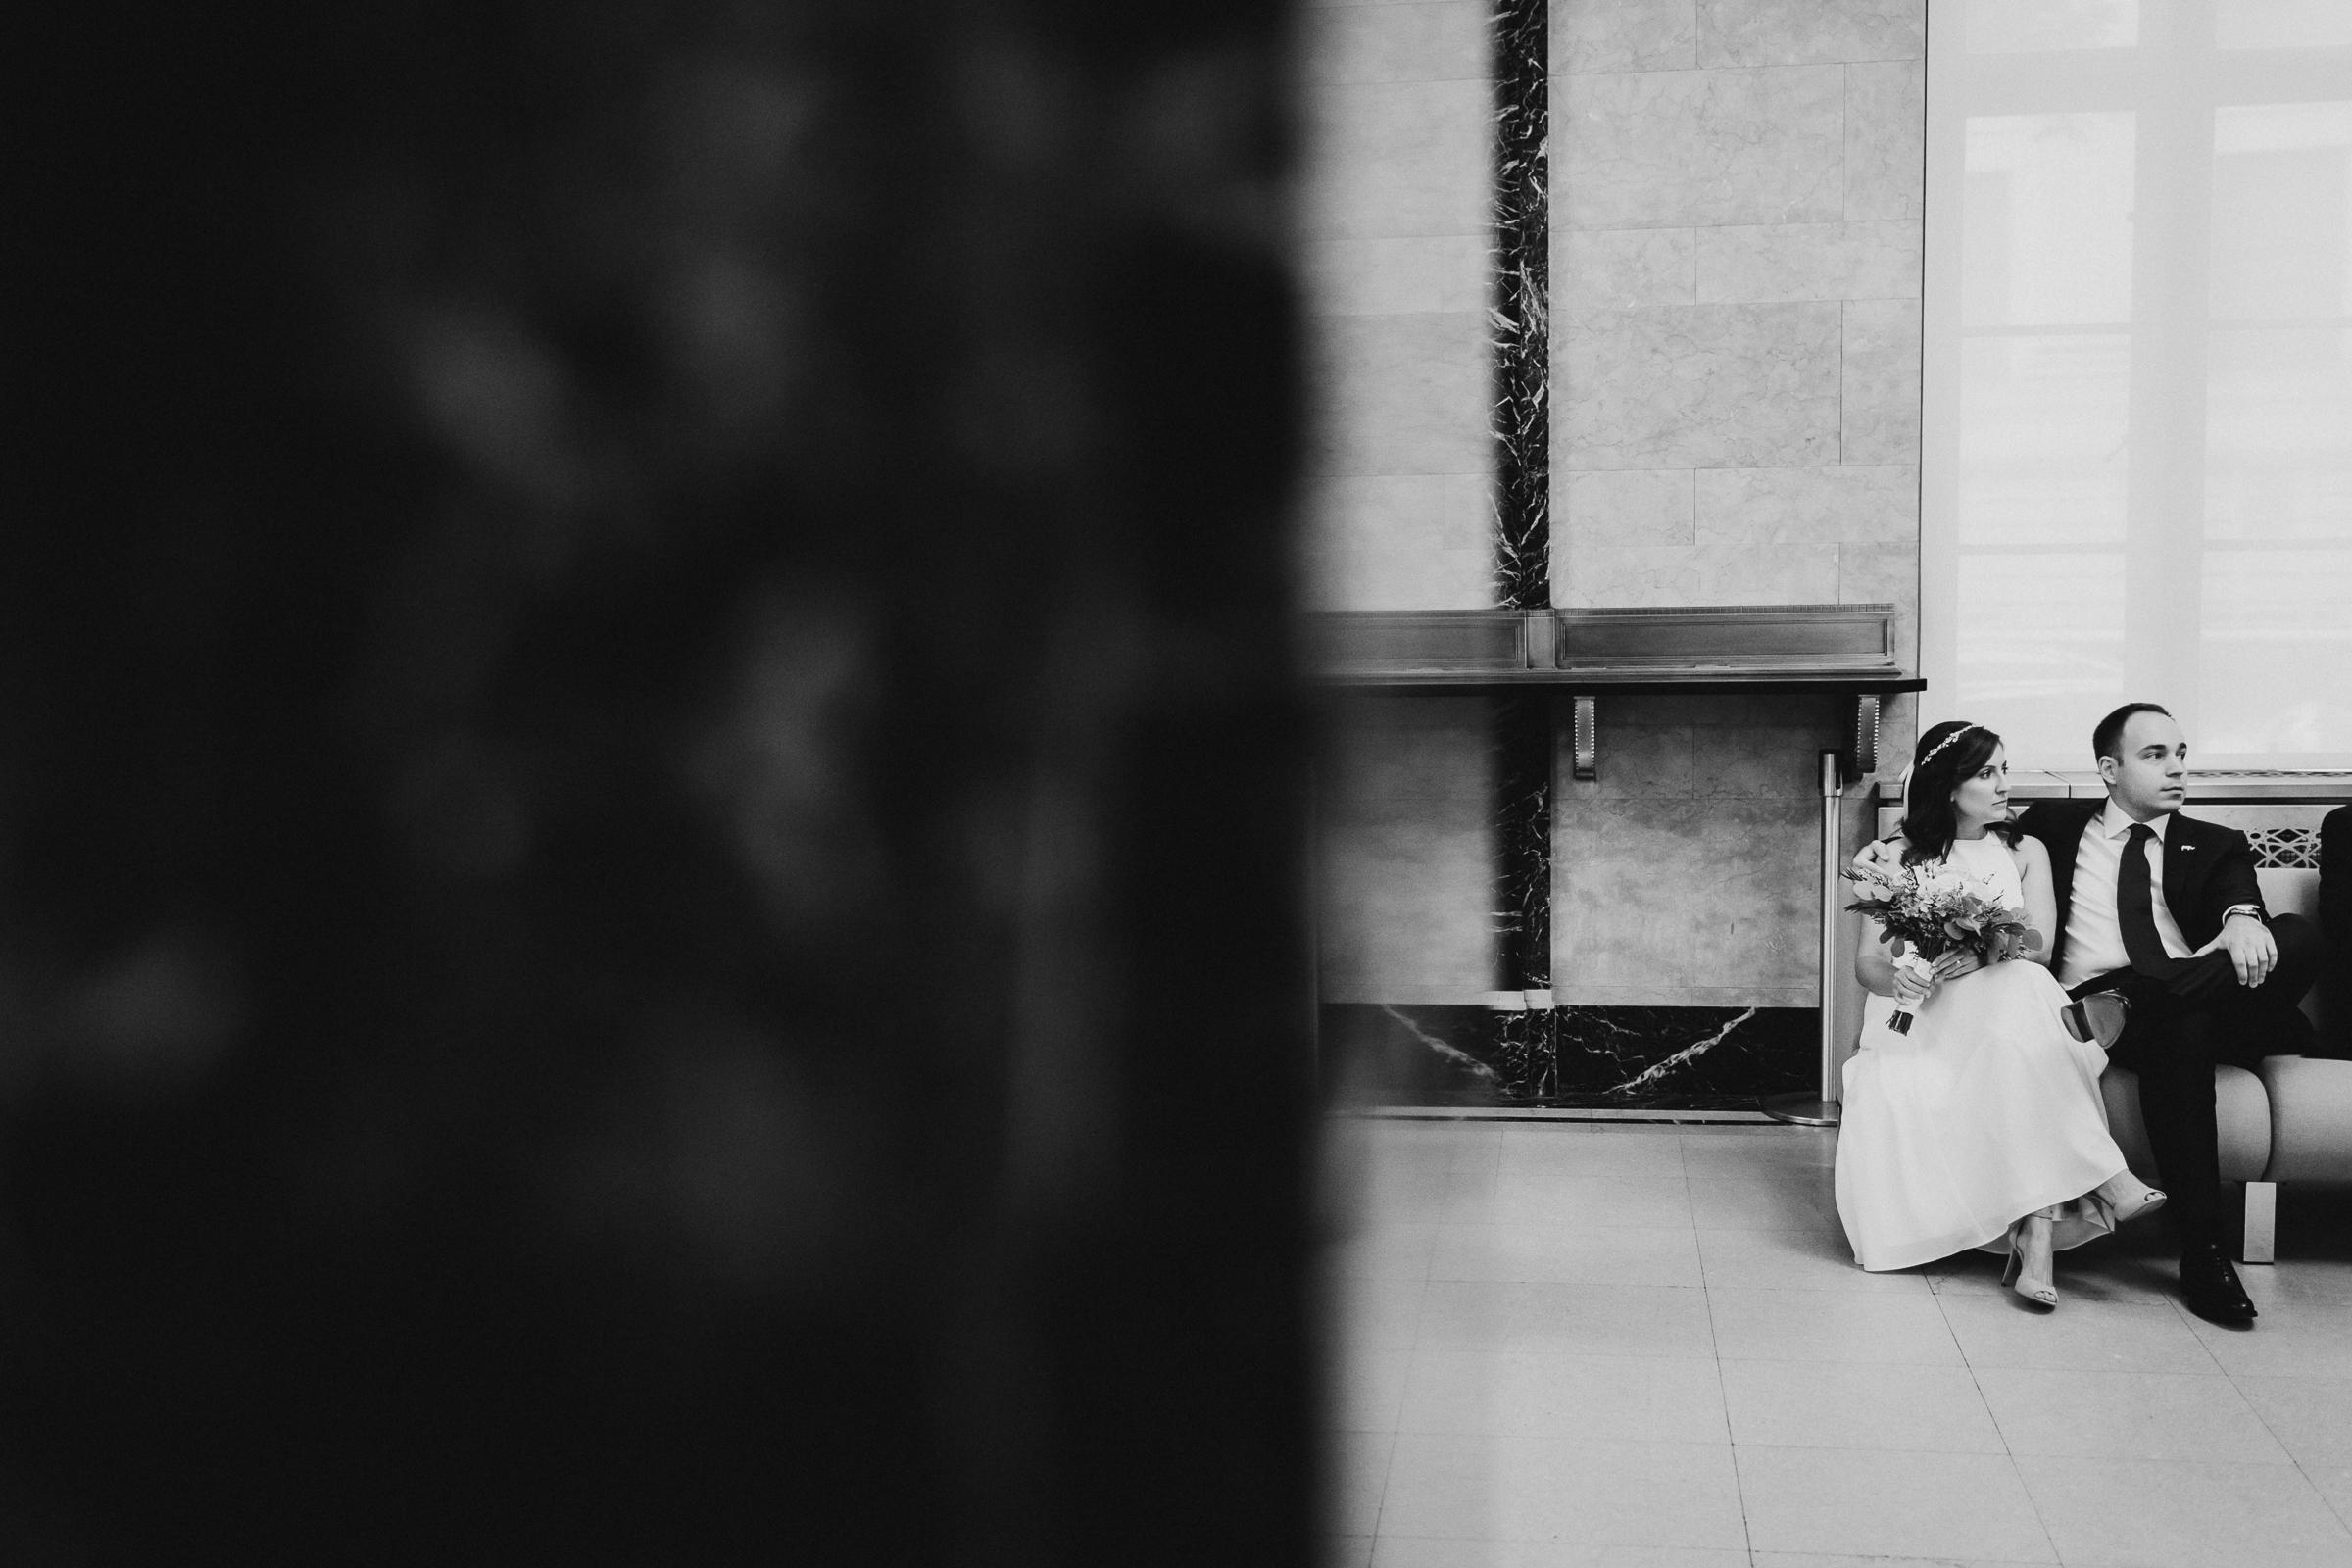 Casa-Apicii-Intimate-Wedding-City-Hall-Elopement-New-York-Documentary-Wedding-Photographer-6.jpg